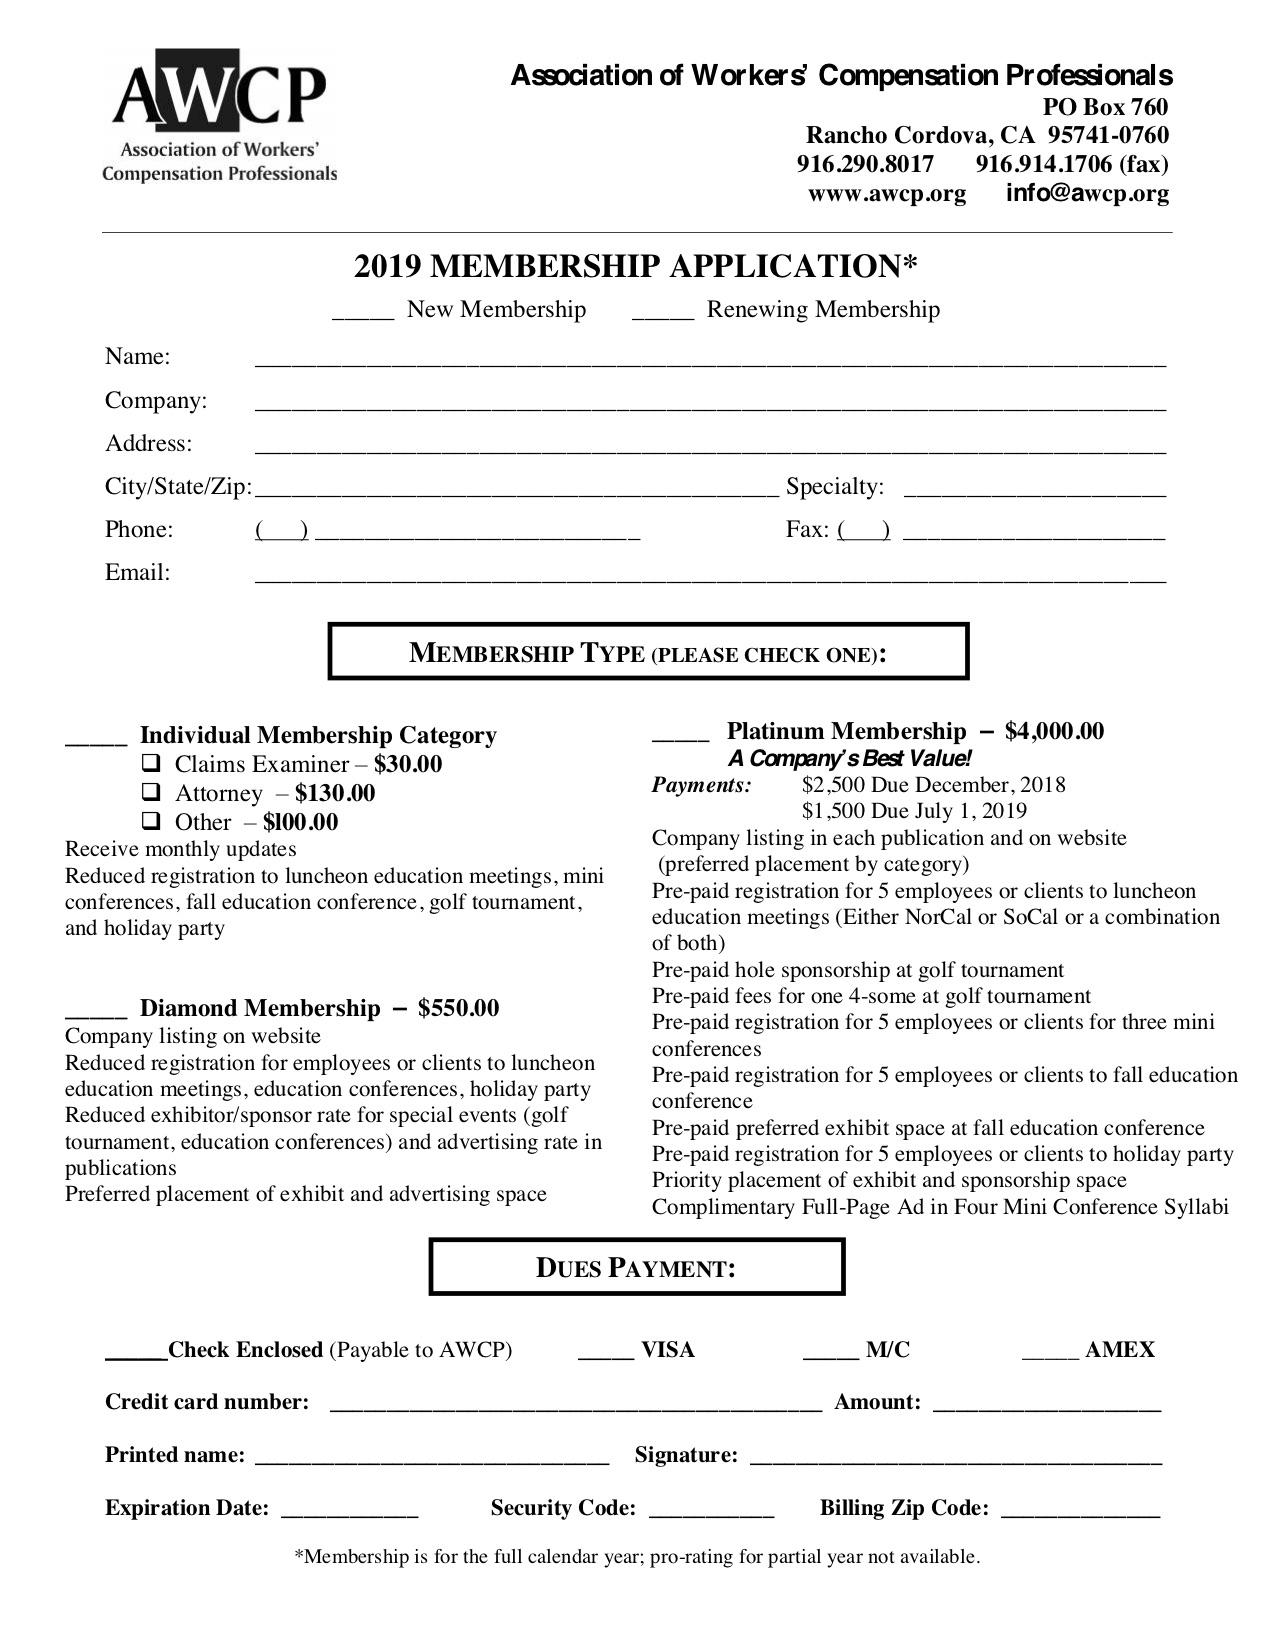 AWCP 2019 Membership Packet 2